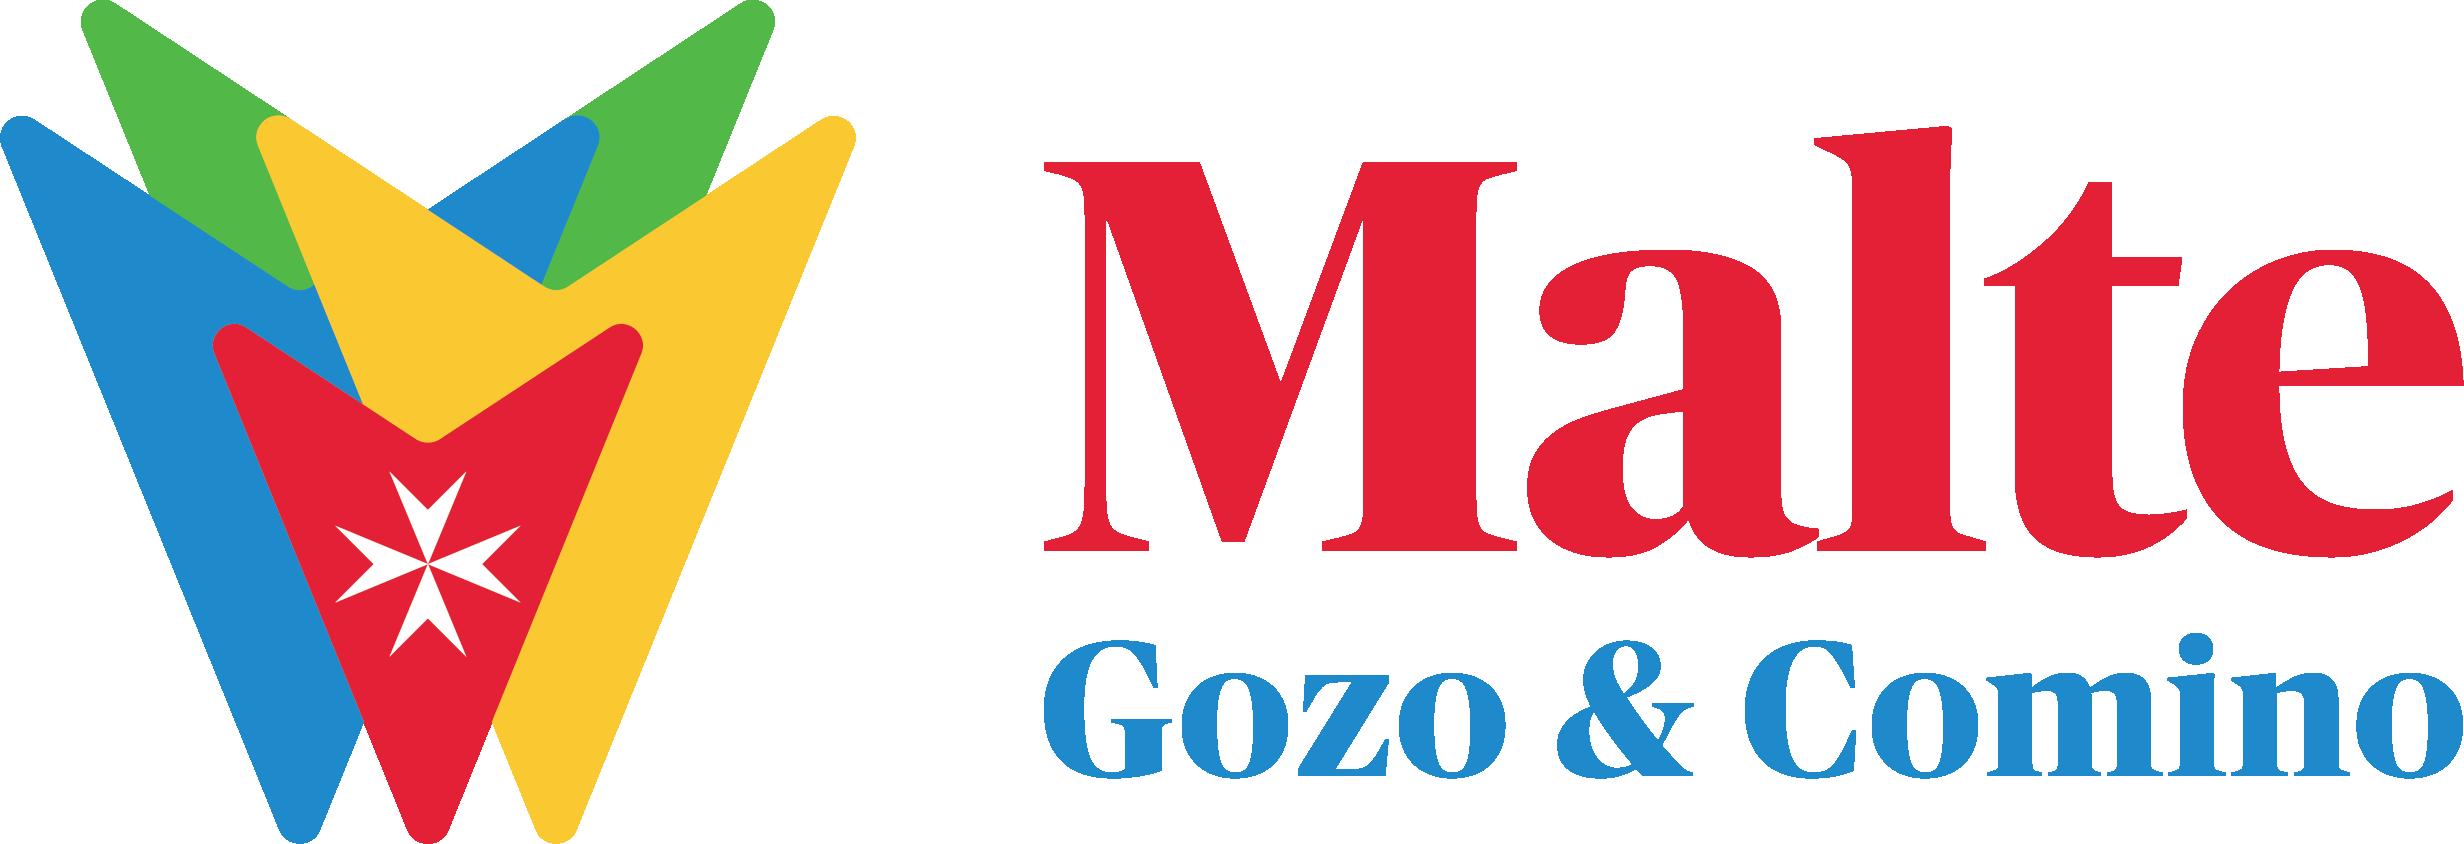 Malte Gozo & Comino.png